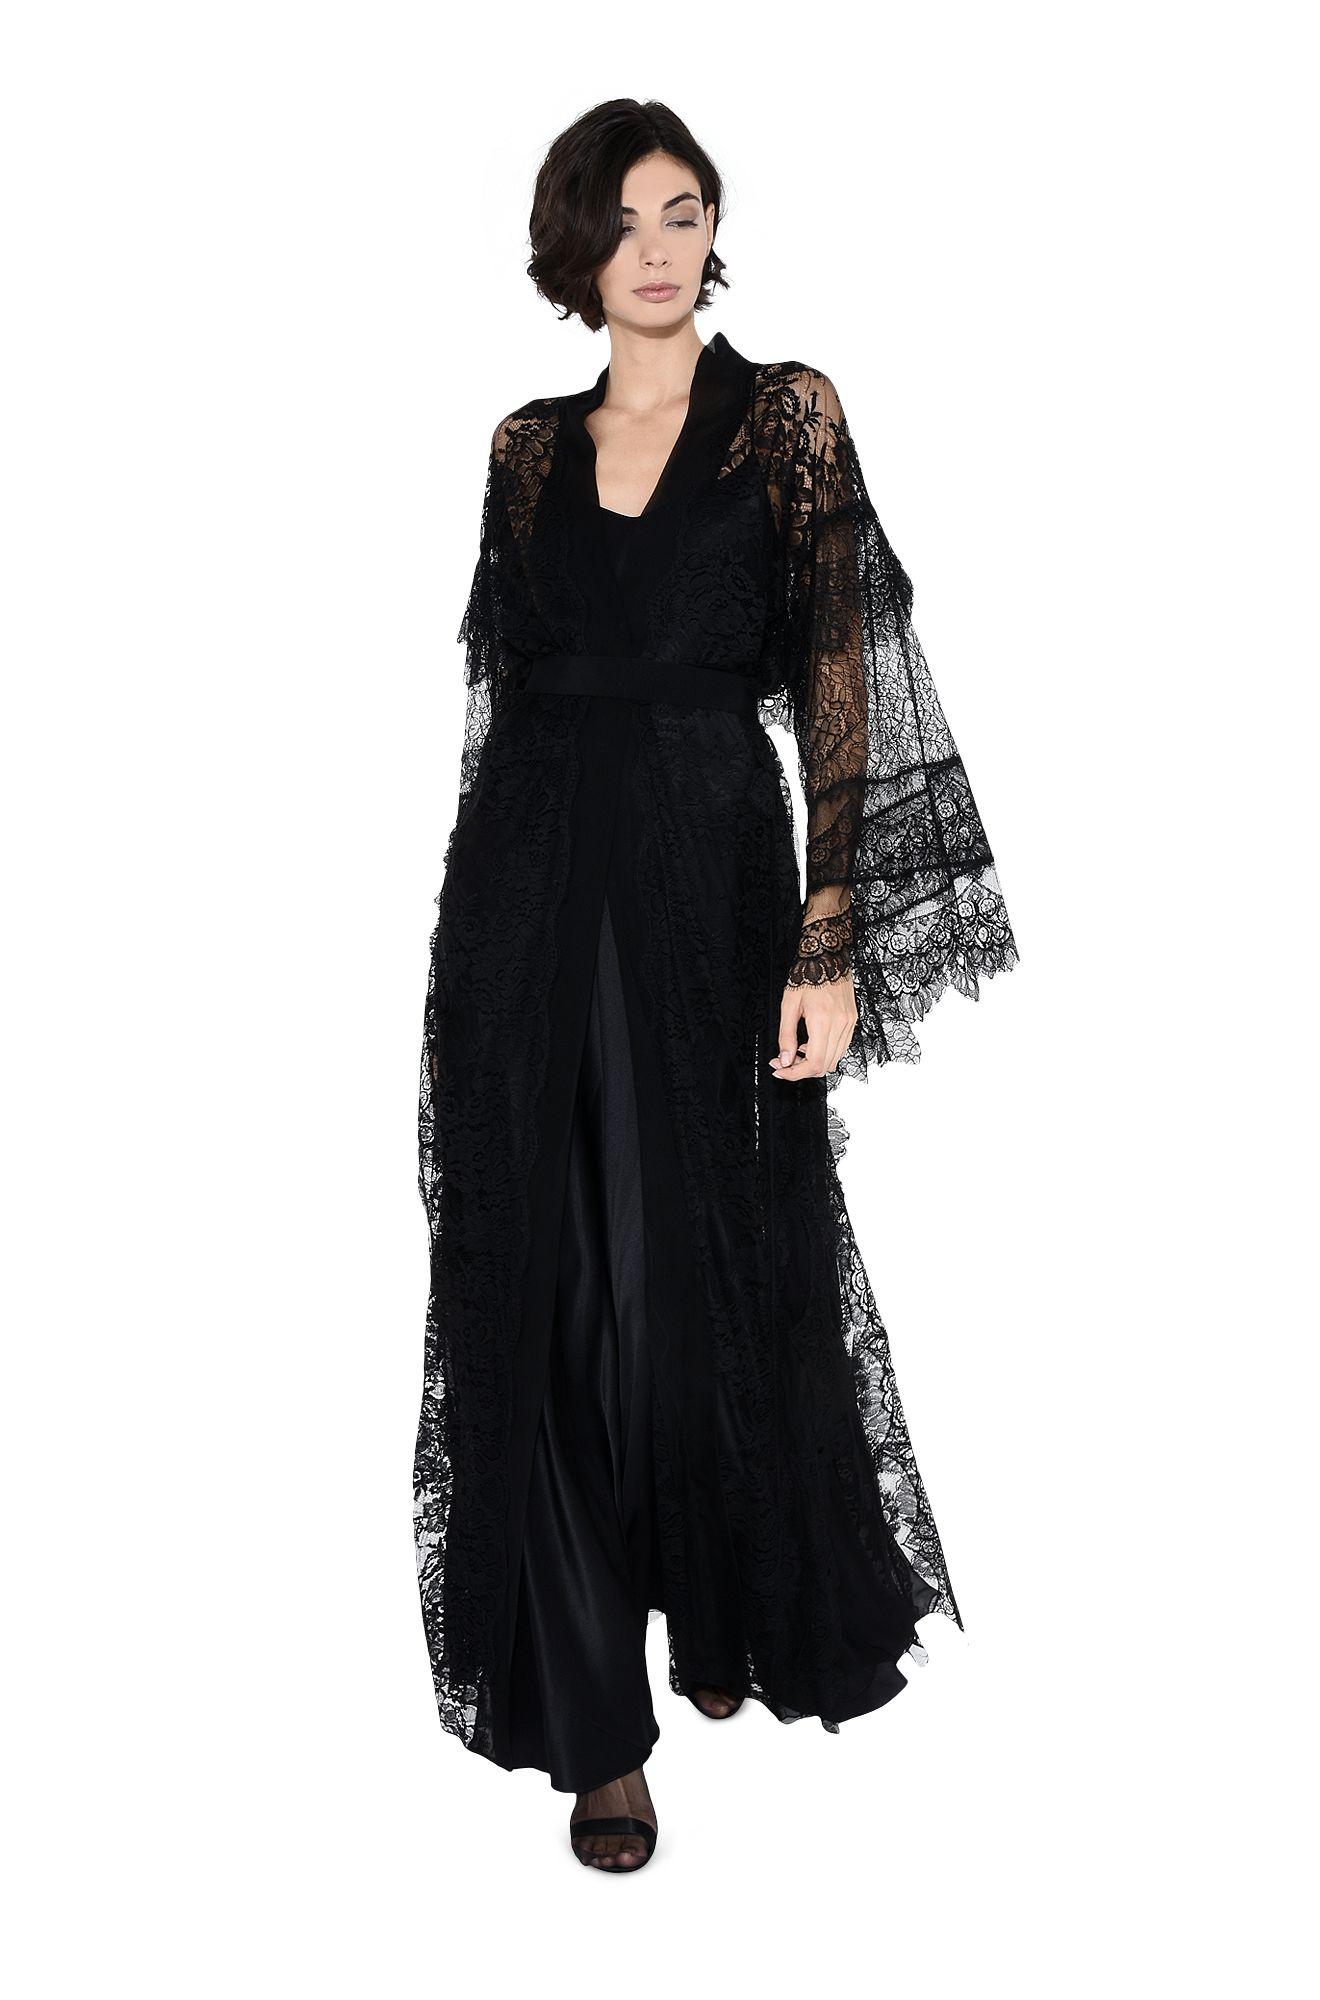 KIMONO MYSTERY DRESS